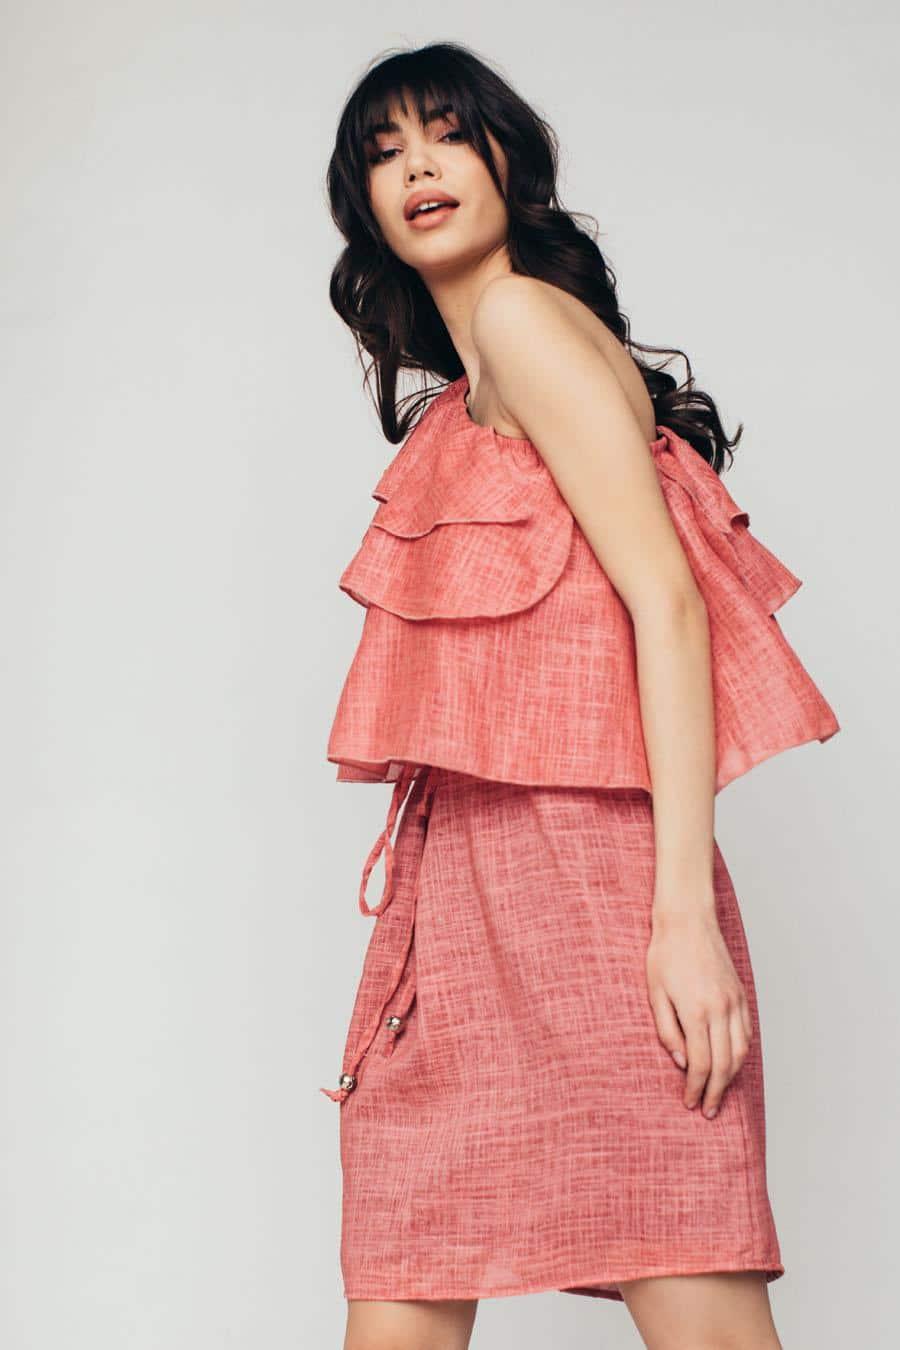 jagger zenska haljina kolekcija prolece leto 2021 ss 2021 kupi online jg 5504 10 03